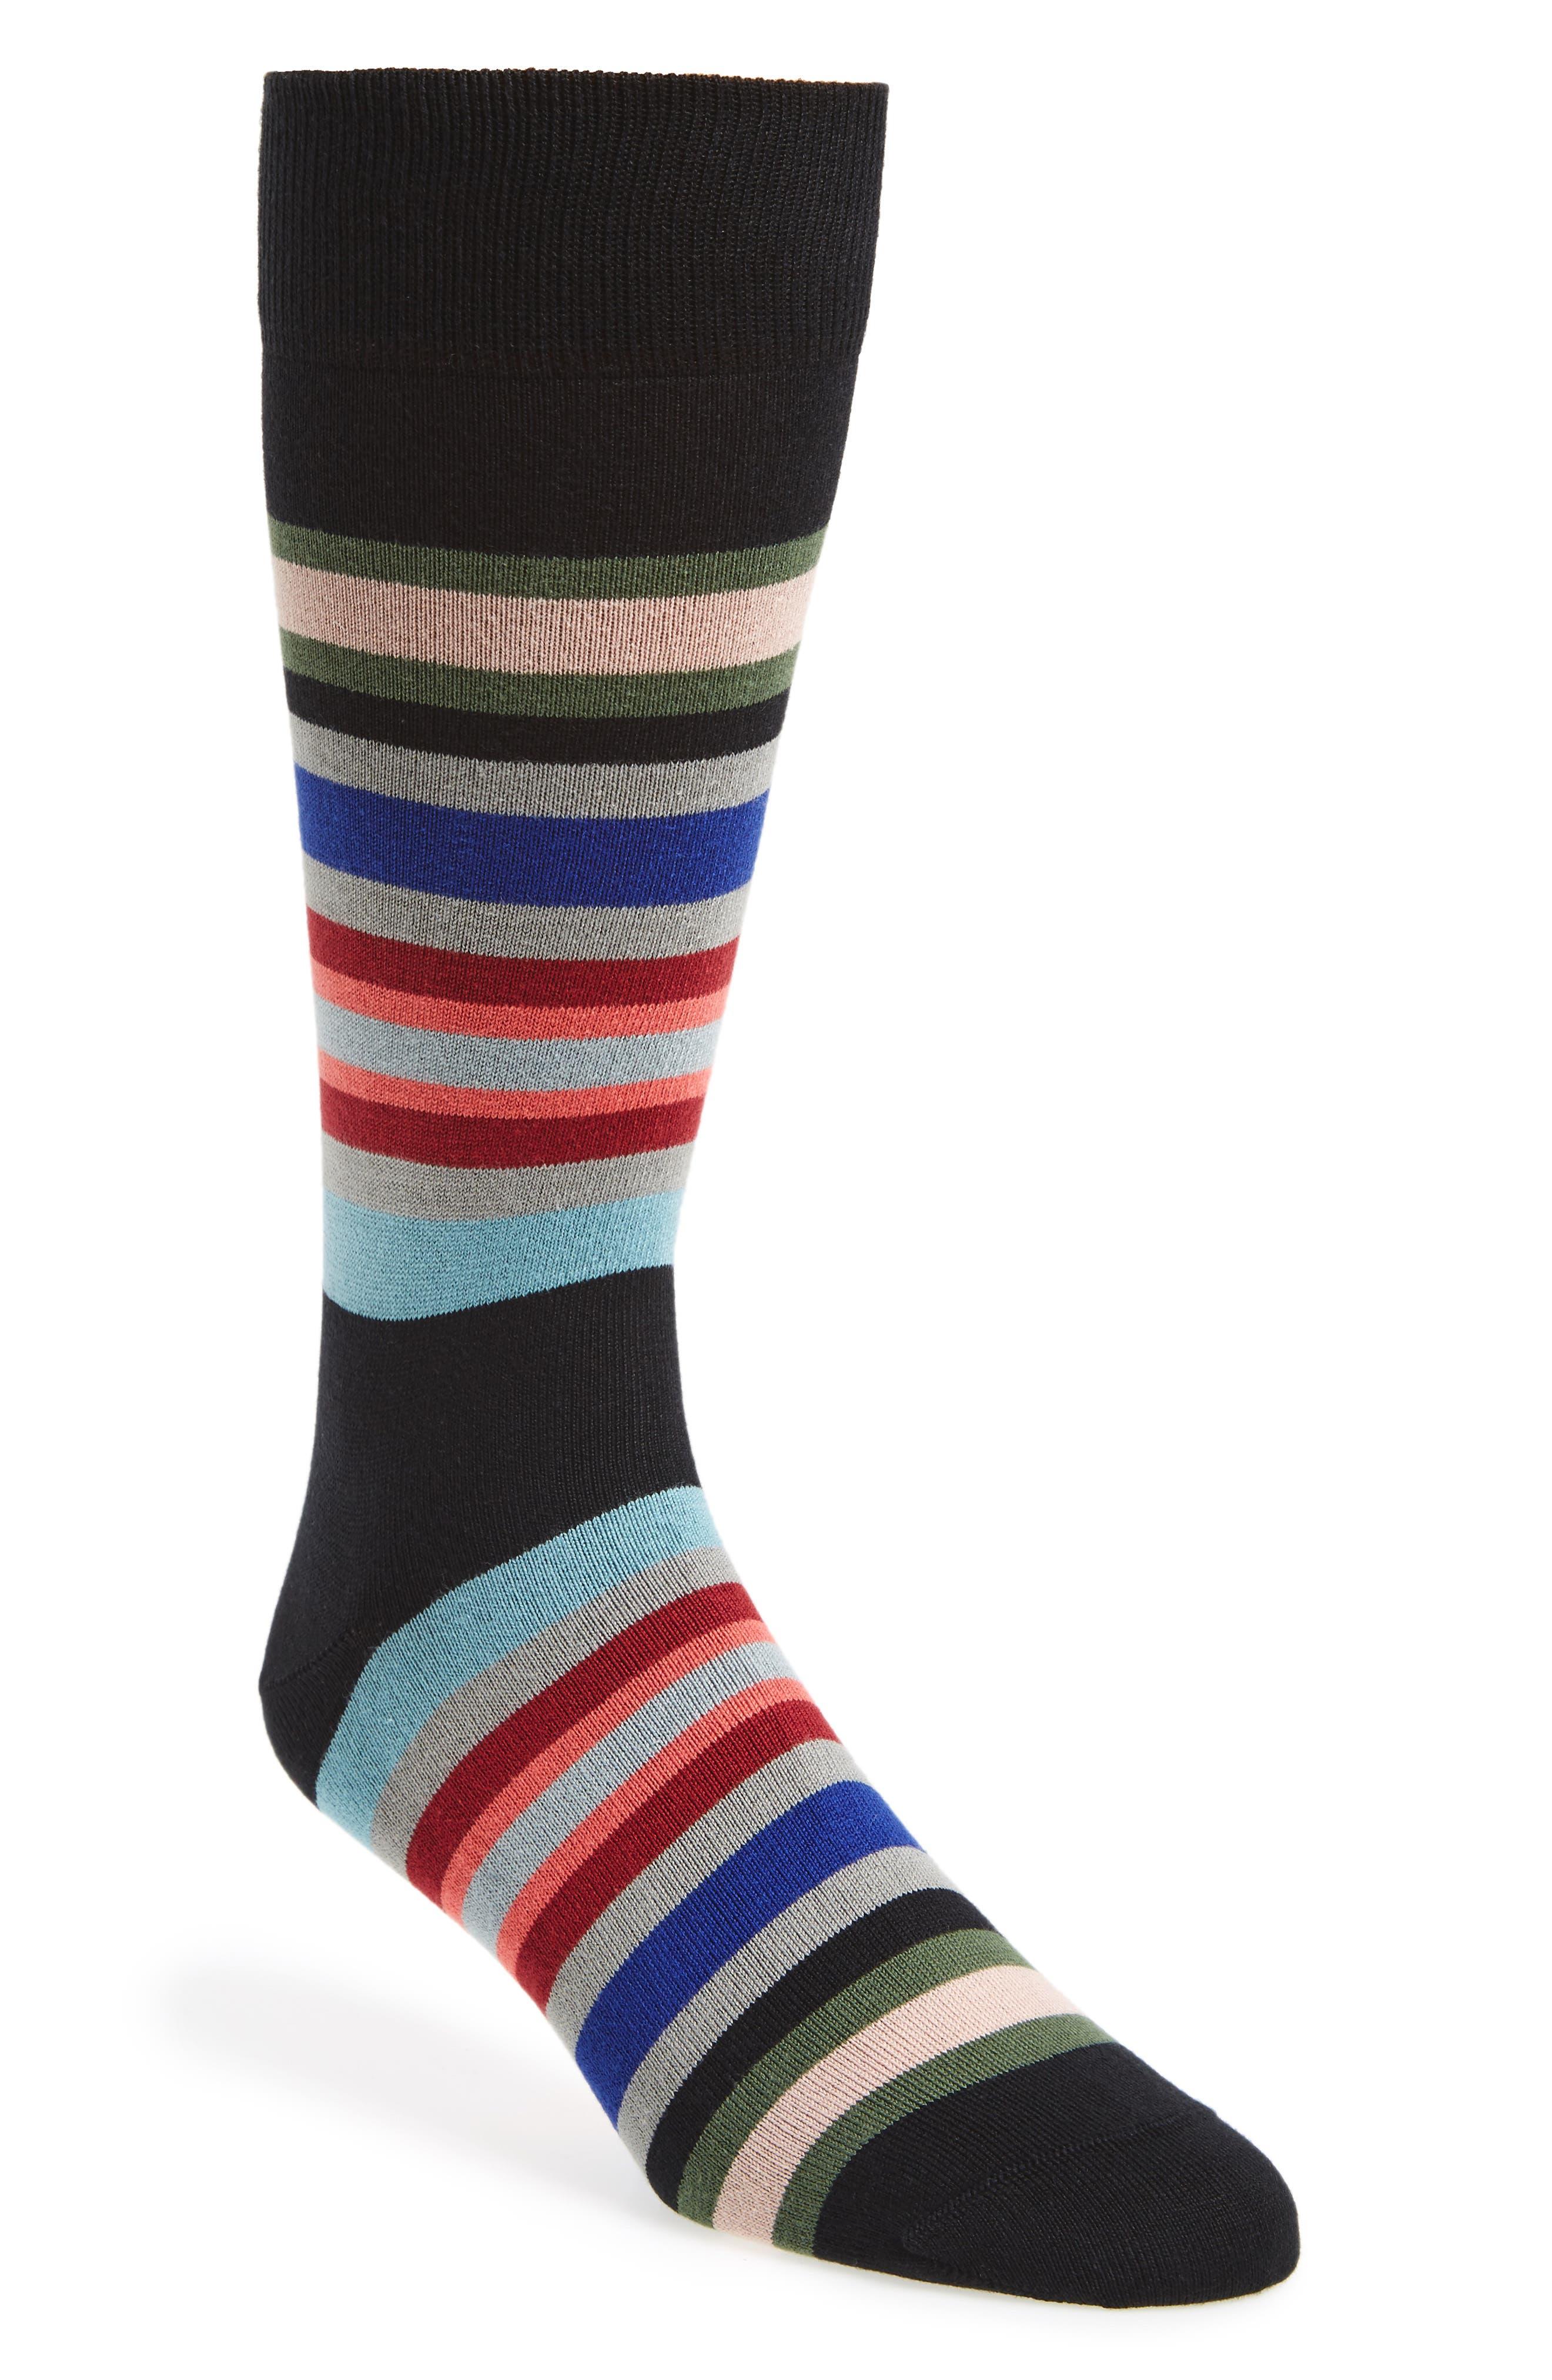 Main Image - Paul Smith Kew Stripe Socks